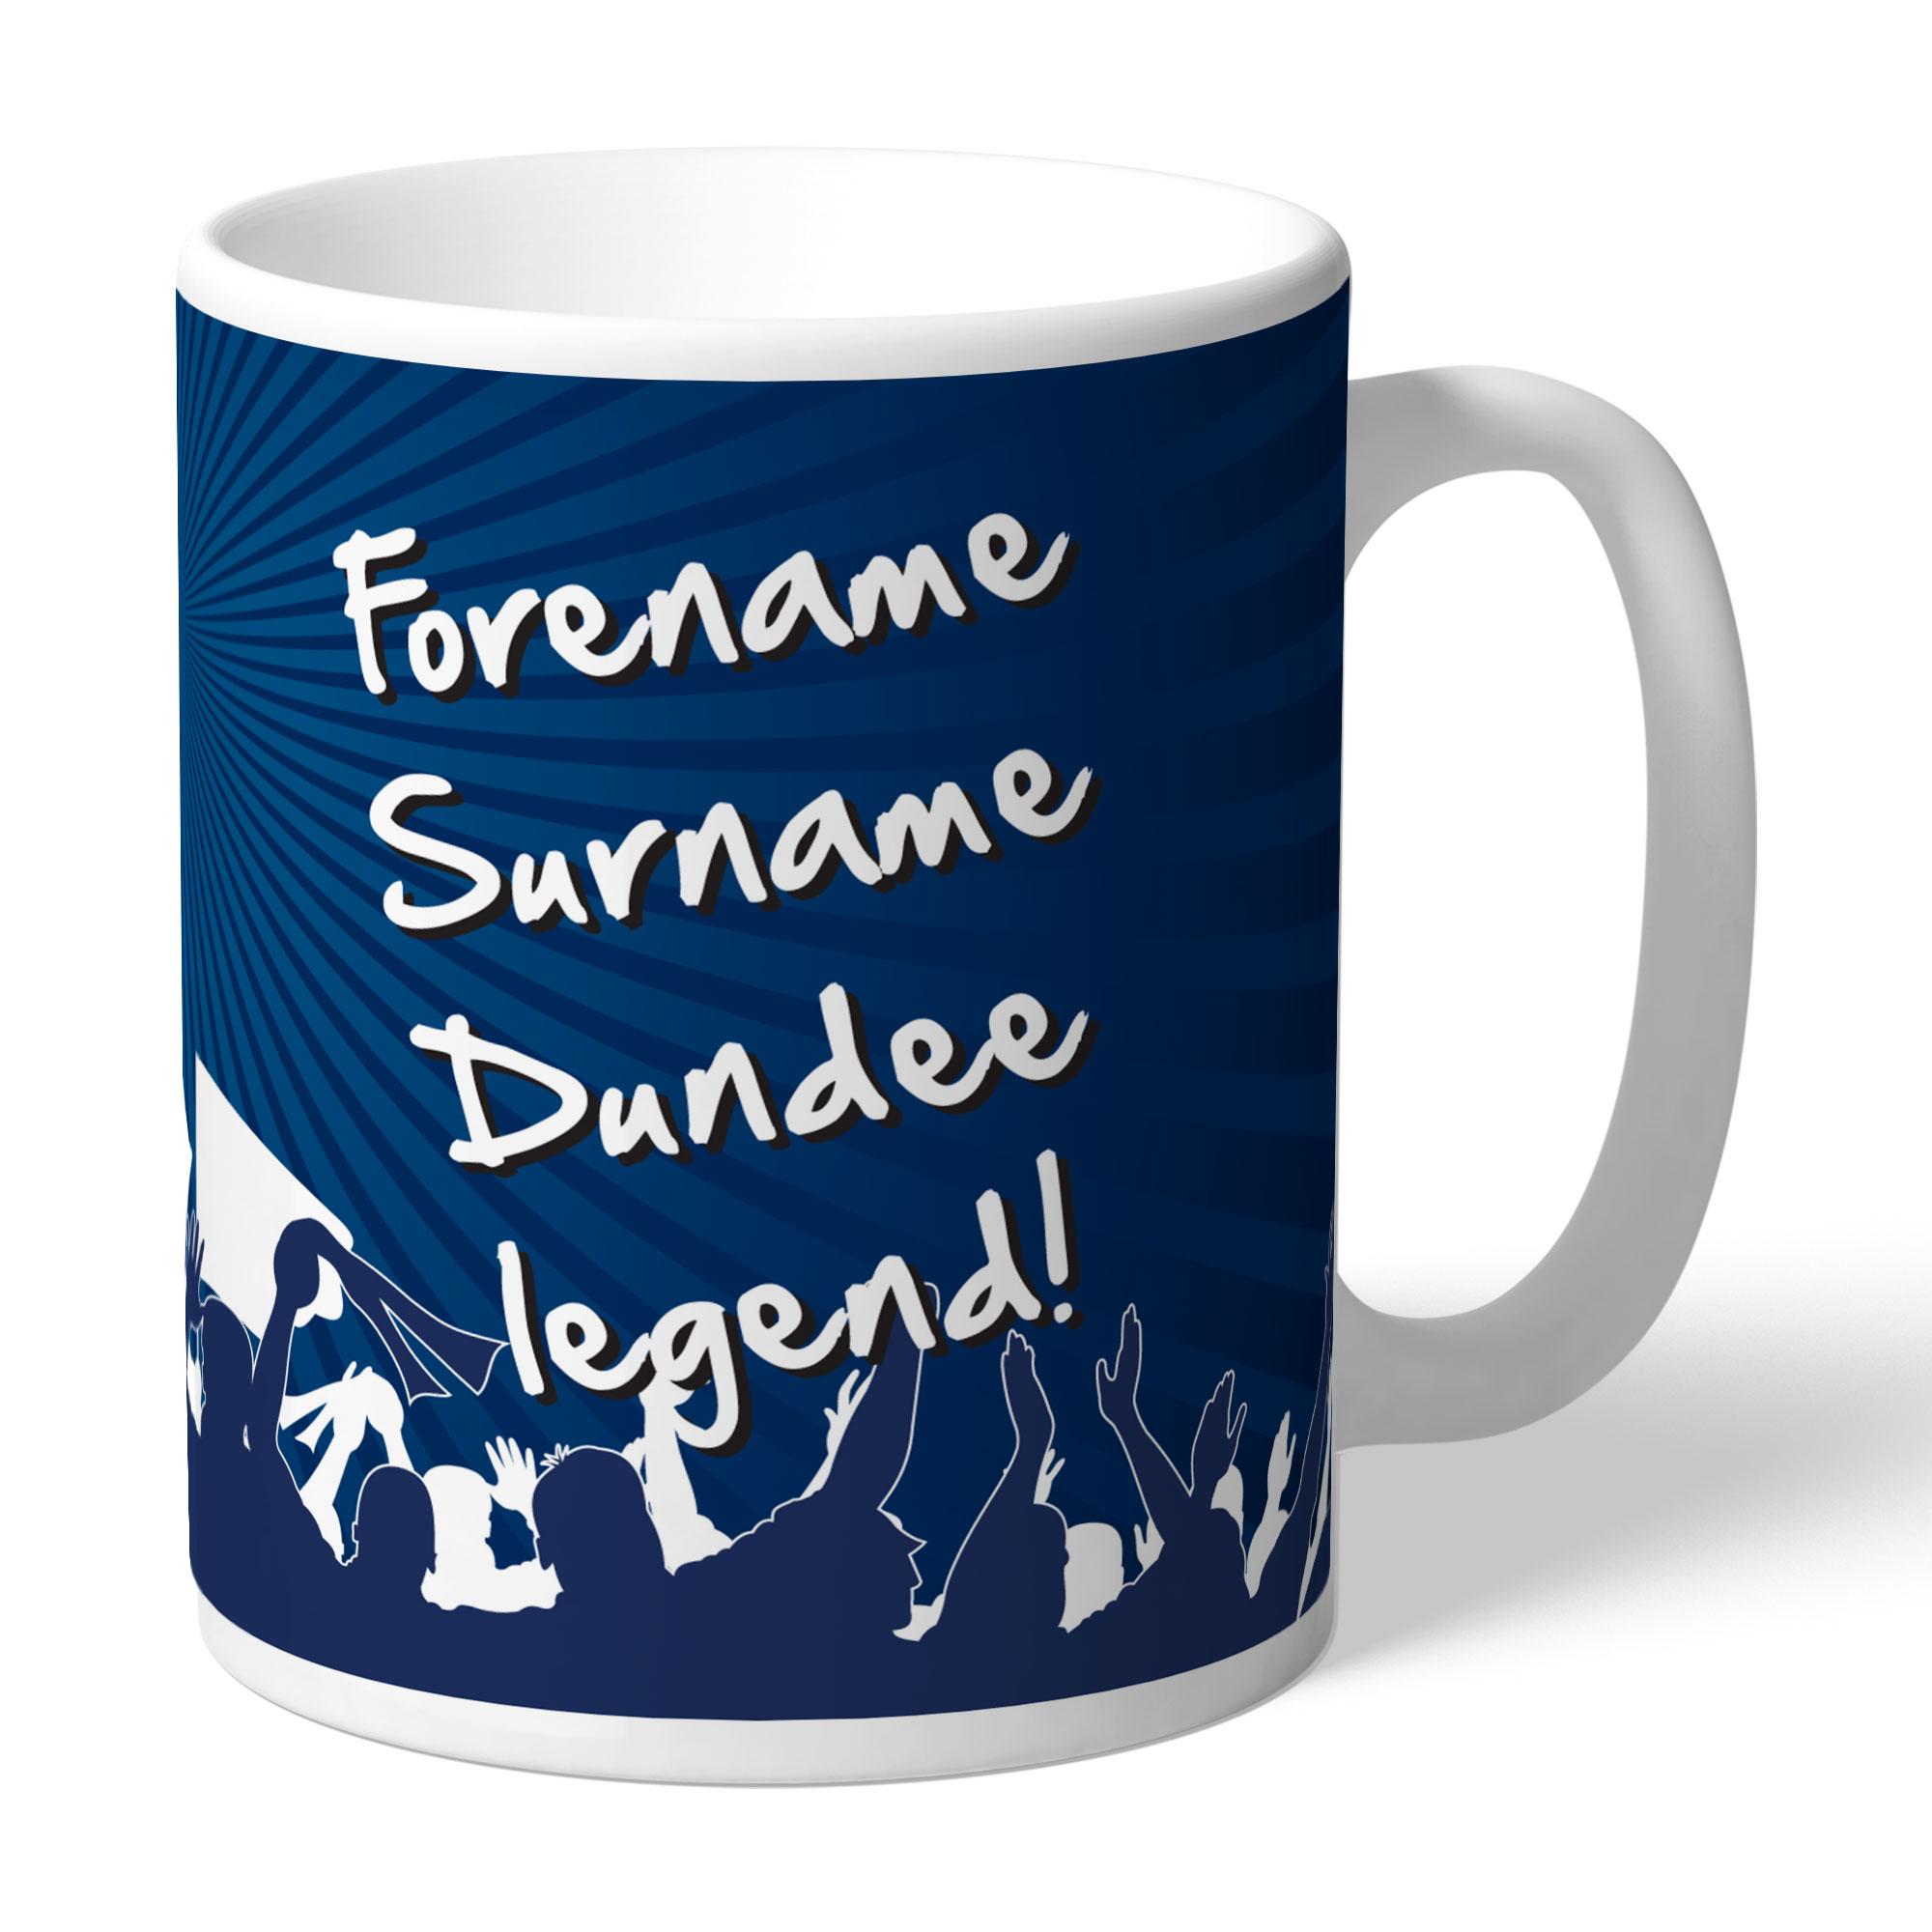 Dundee FC Legend Mug